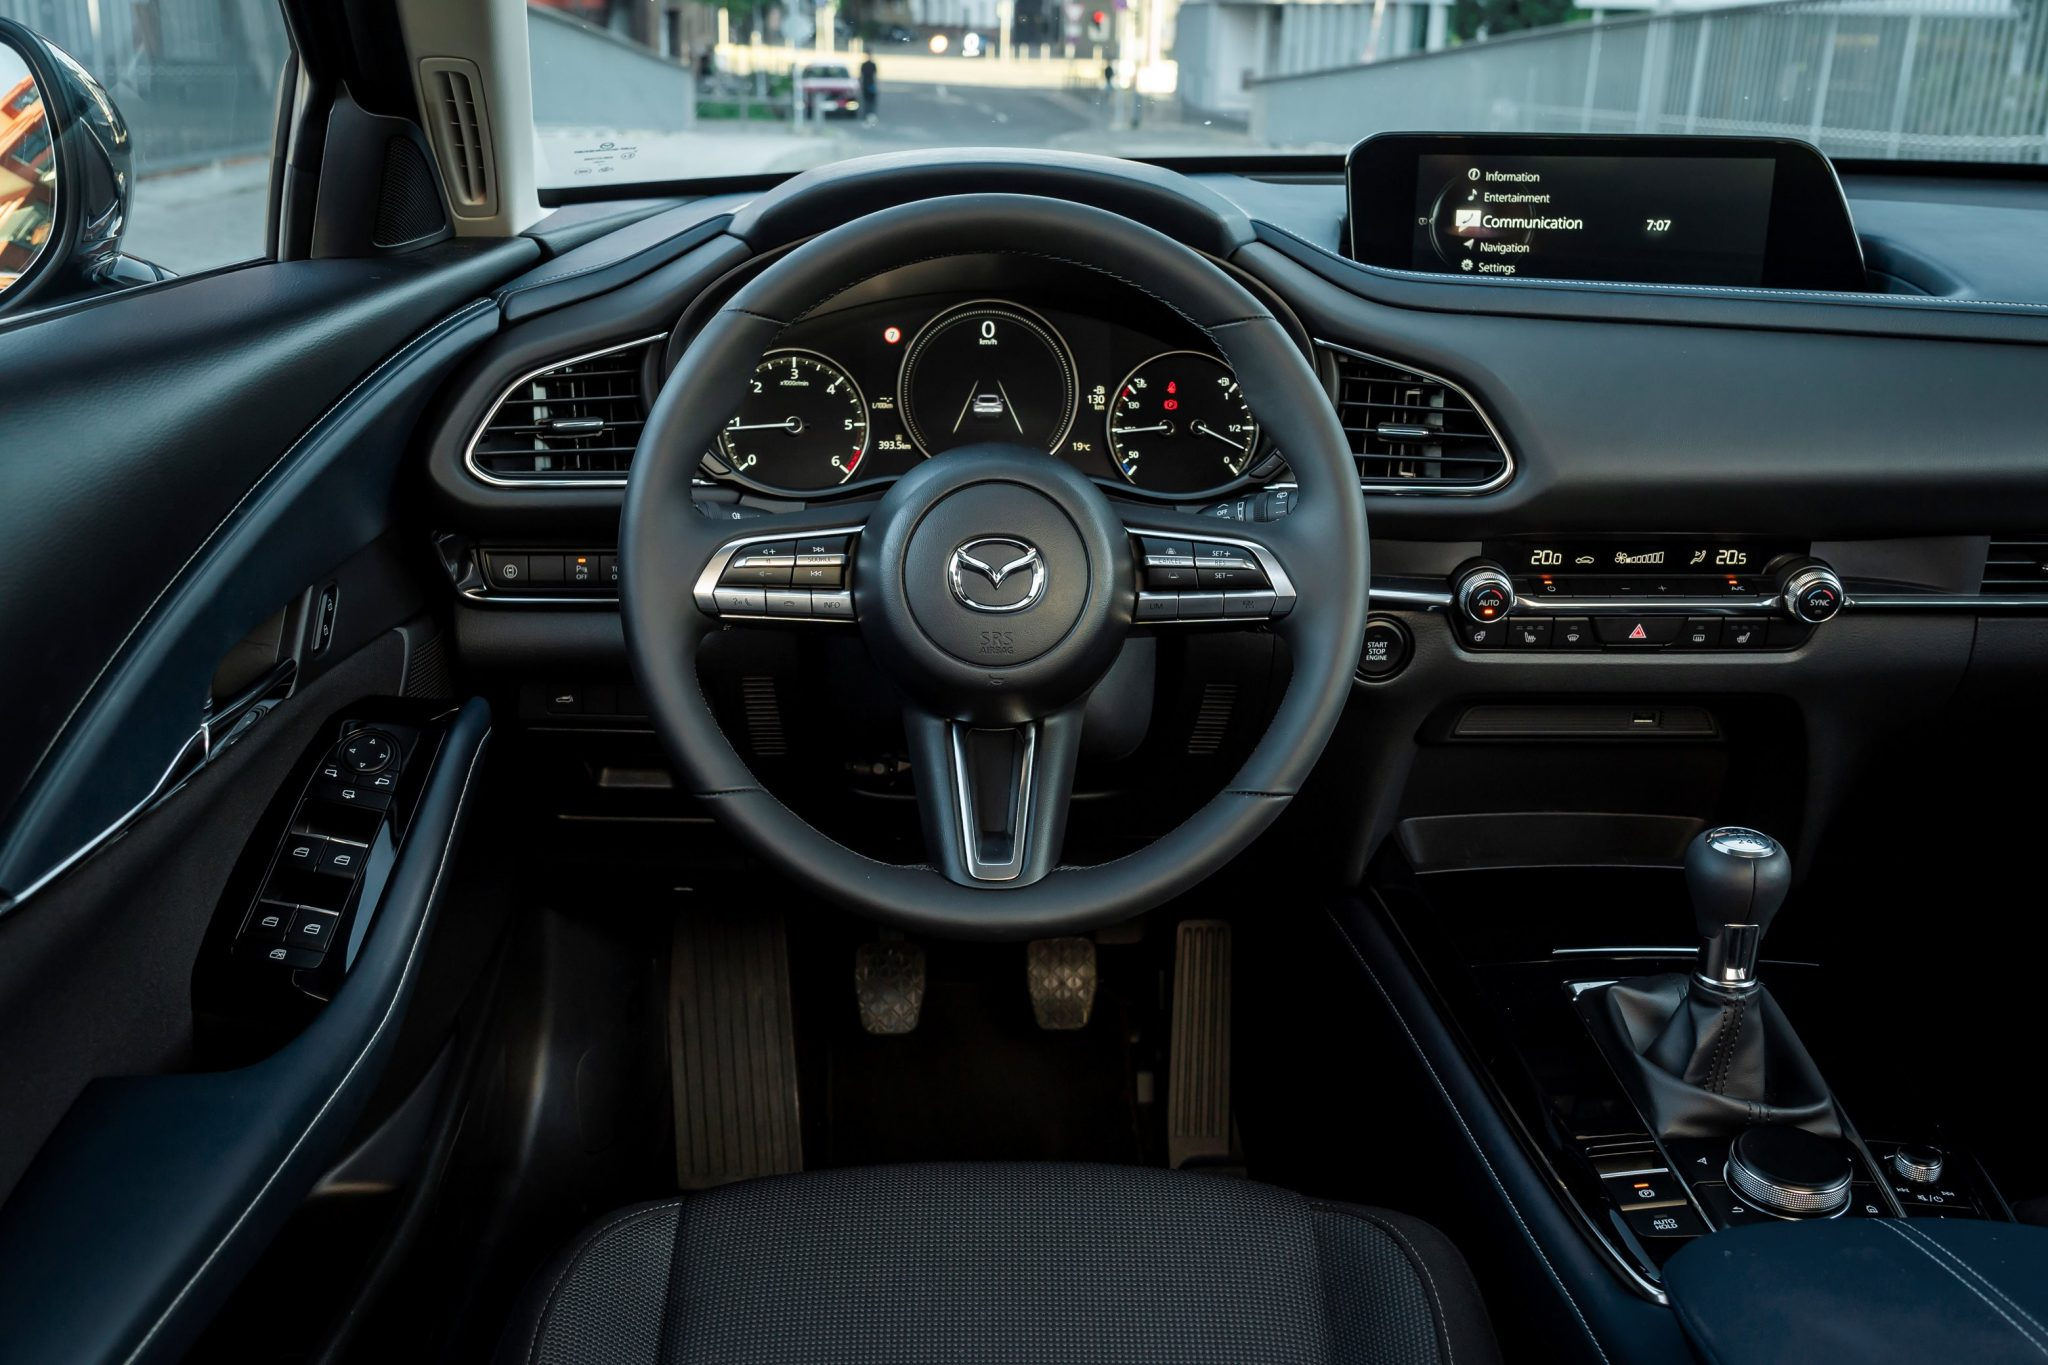 Mazda-CX-30 infotainment